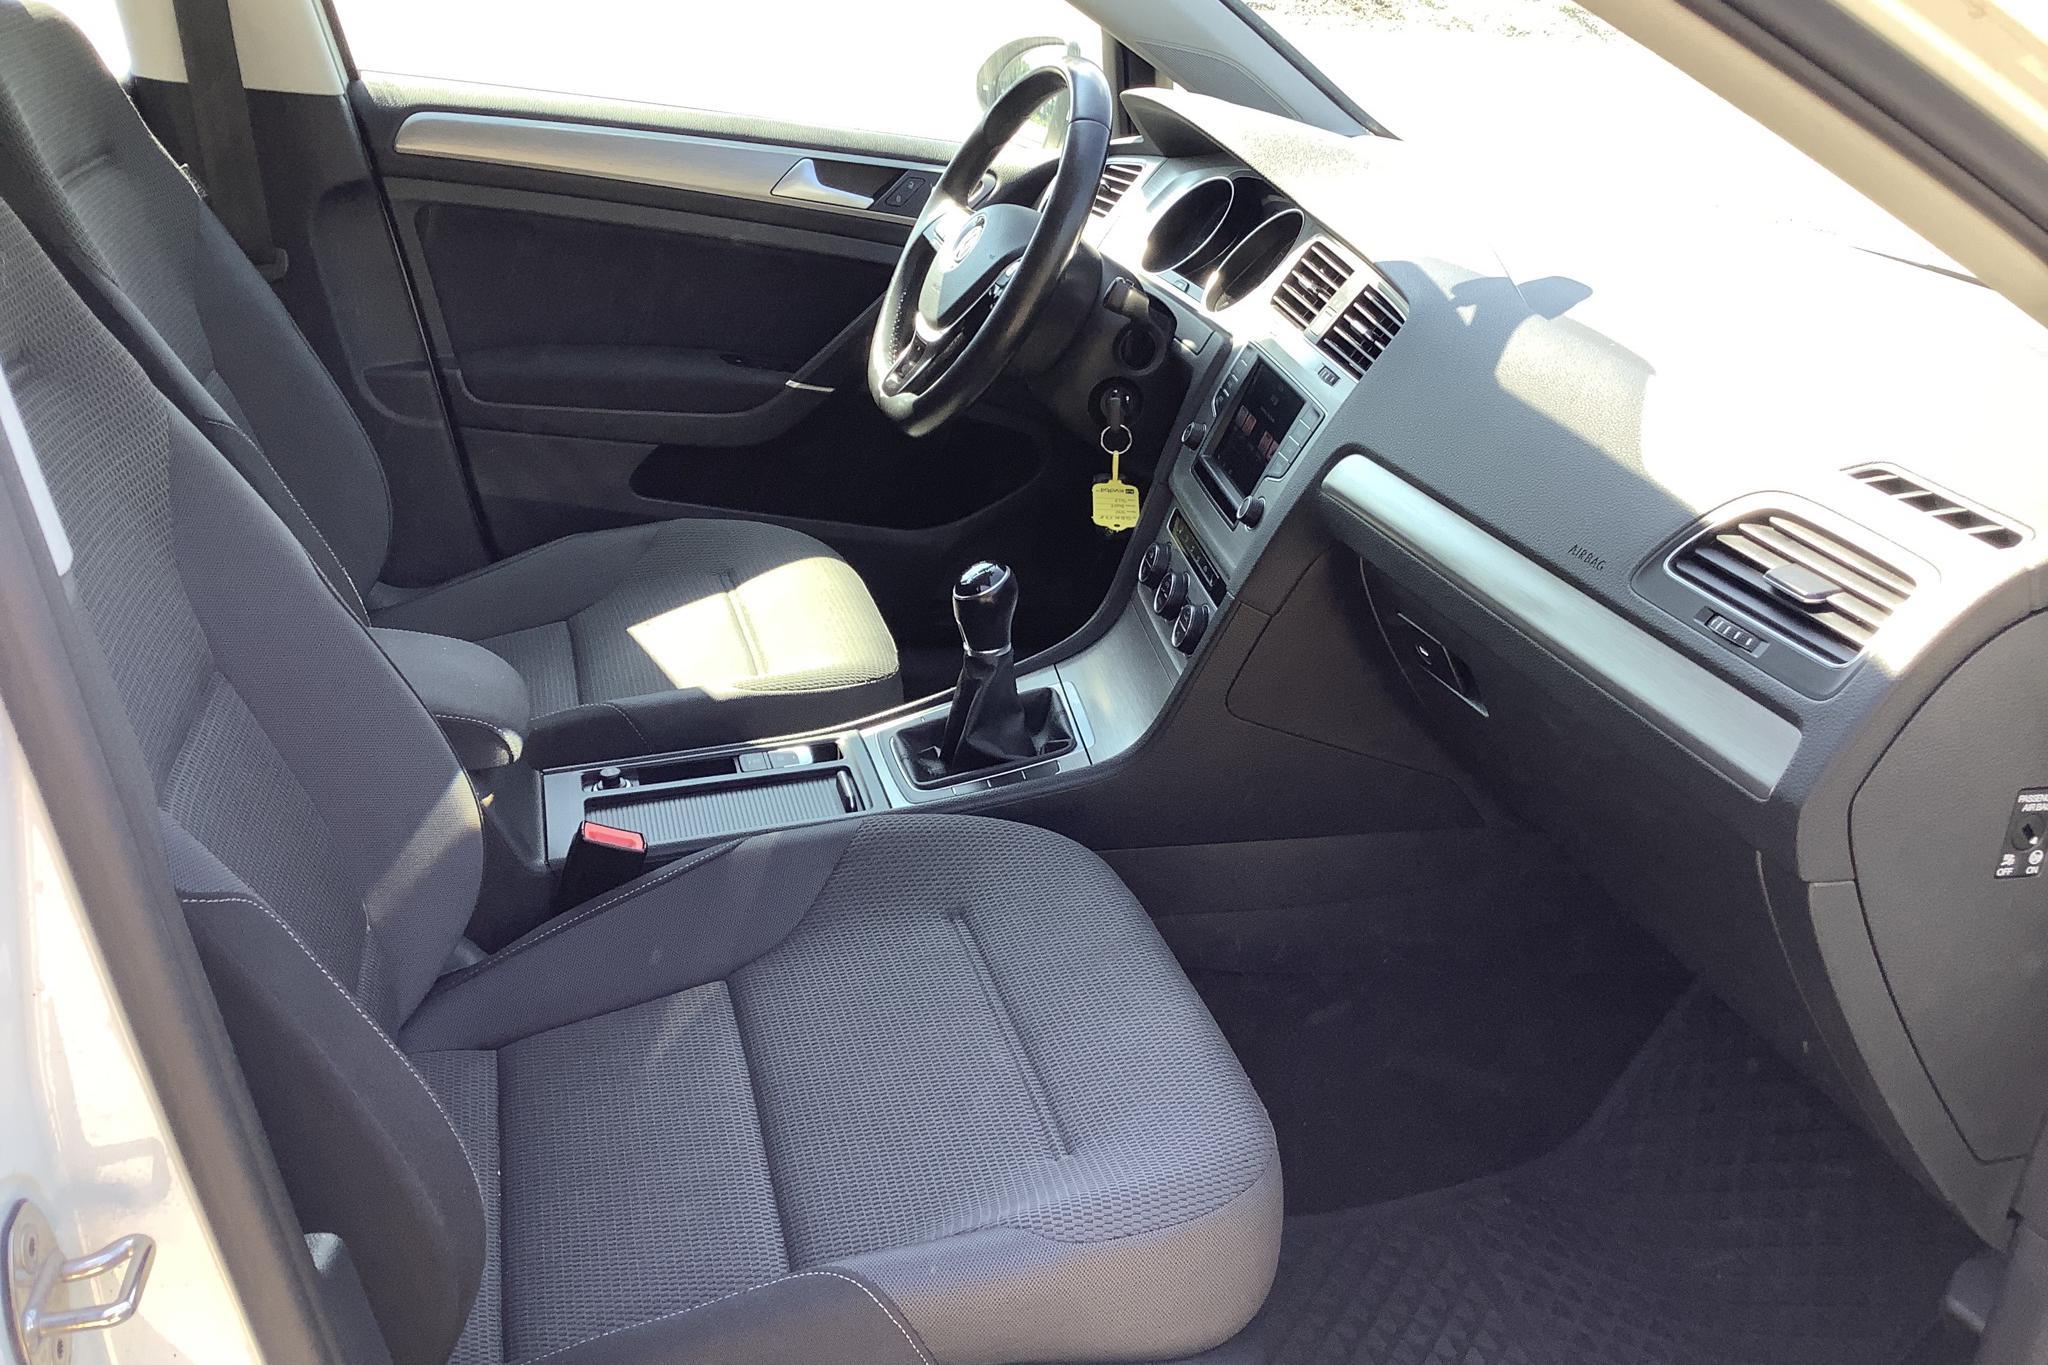 VW Golf VII 1.4 TSI Multifuel Sportscombi (125hk) - 121 400 km - Manual - white - 2016